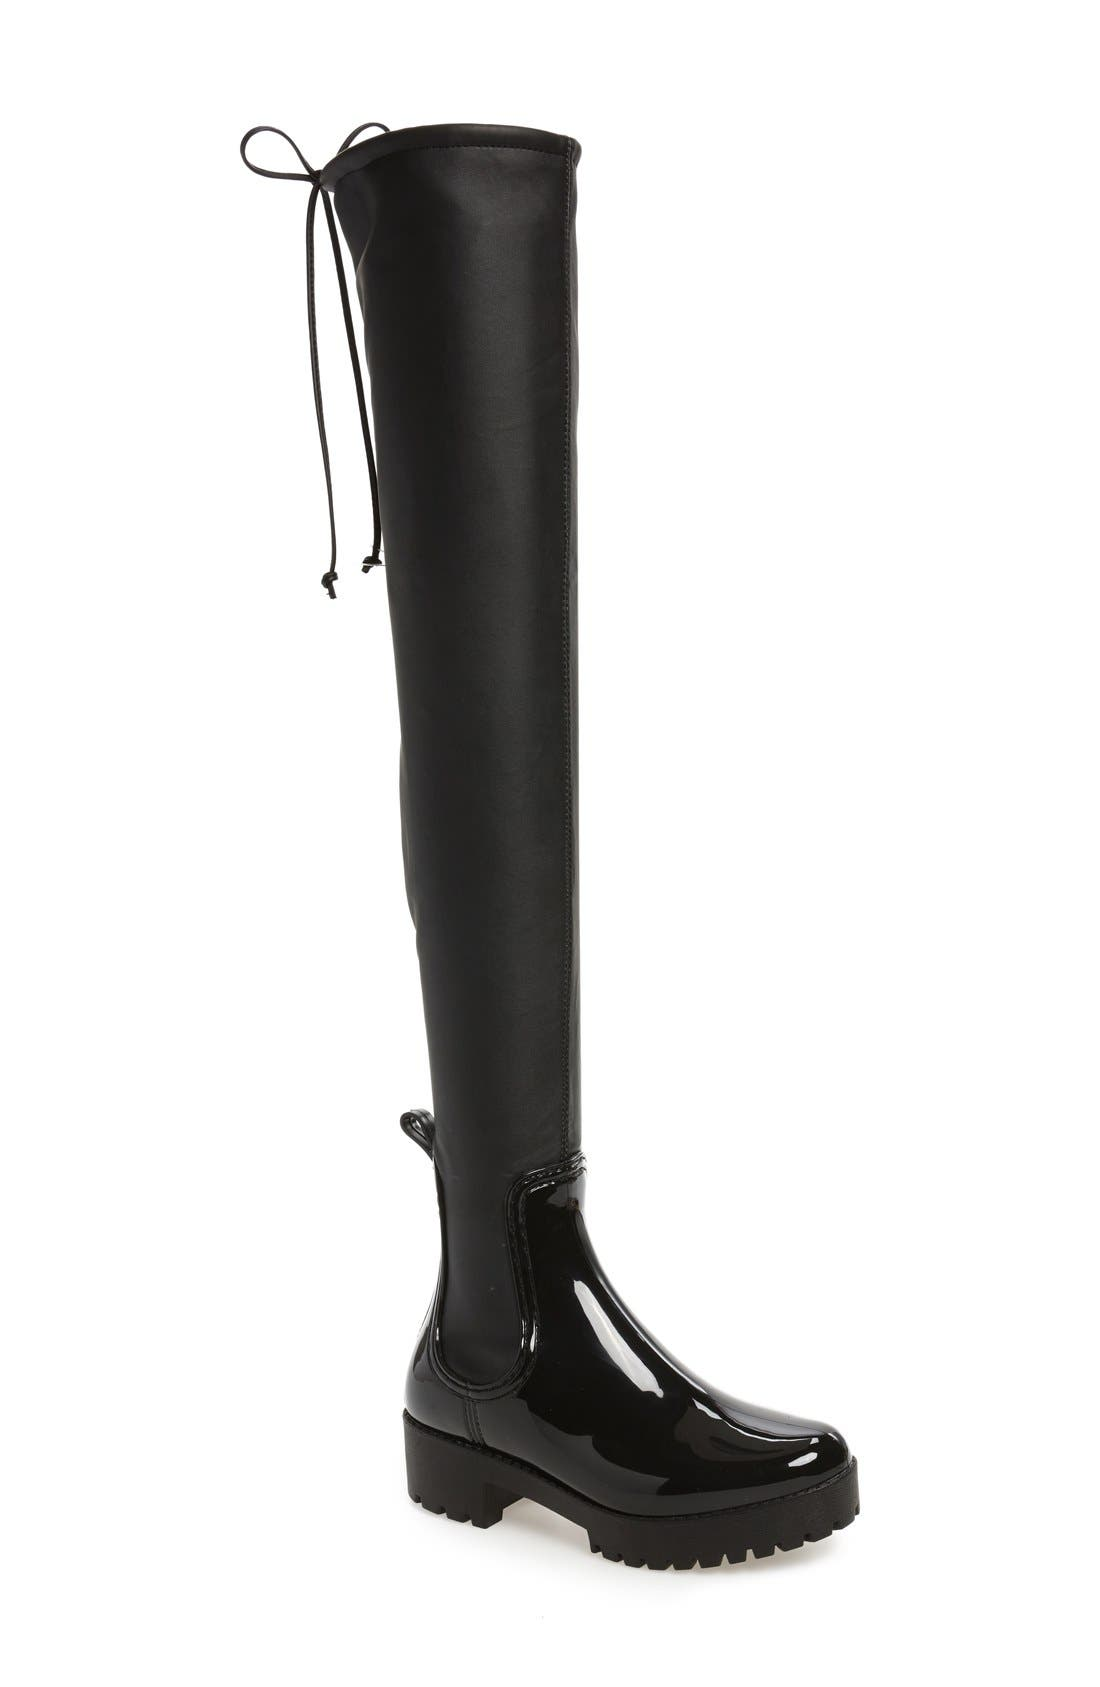 Cloudy Over the Knee Rain Boot,                             Main thumbnail 1, color,                             Black Shiny Black